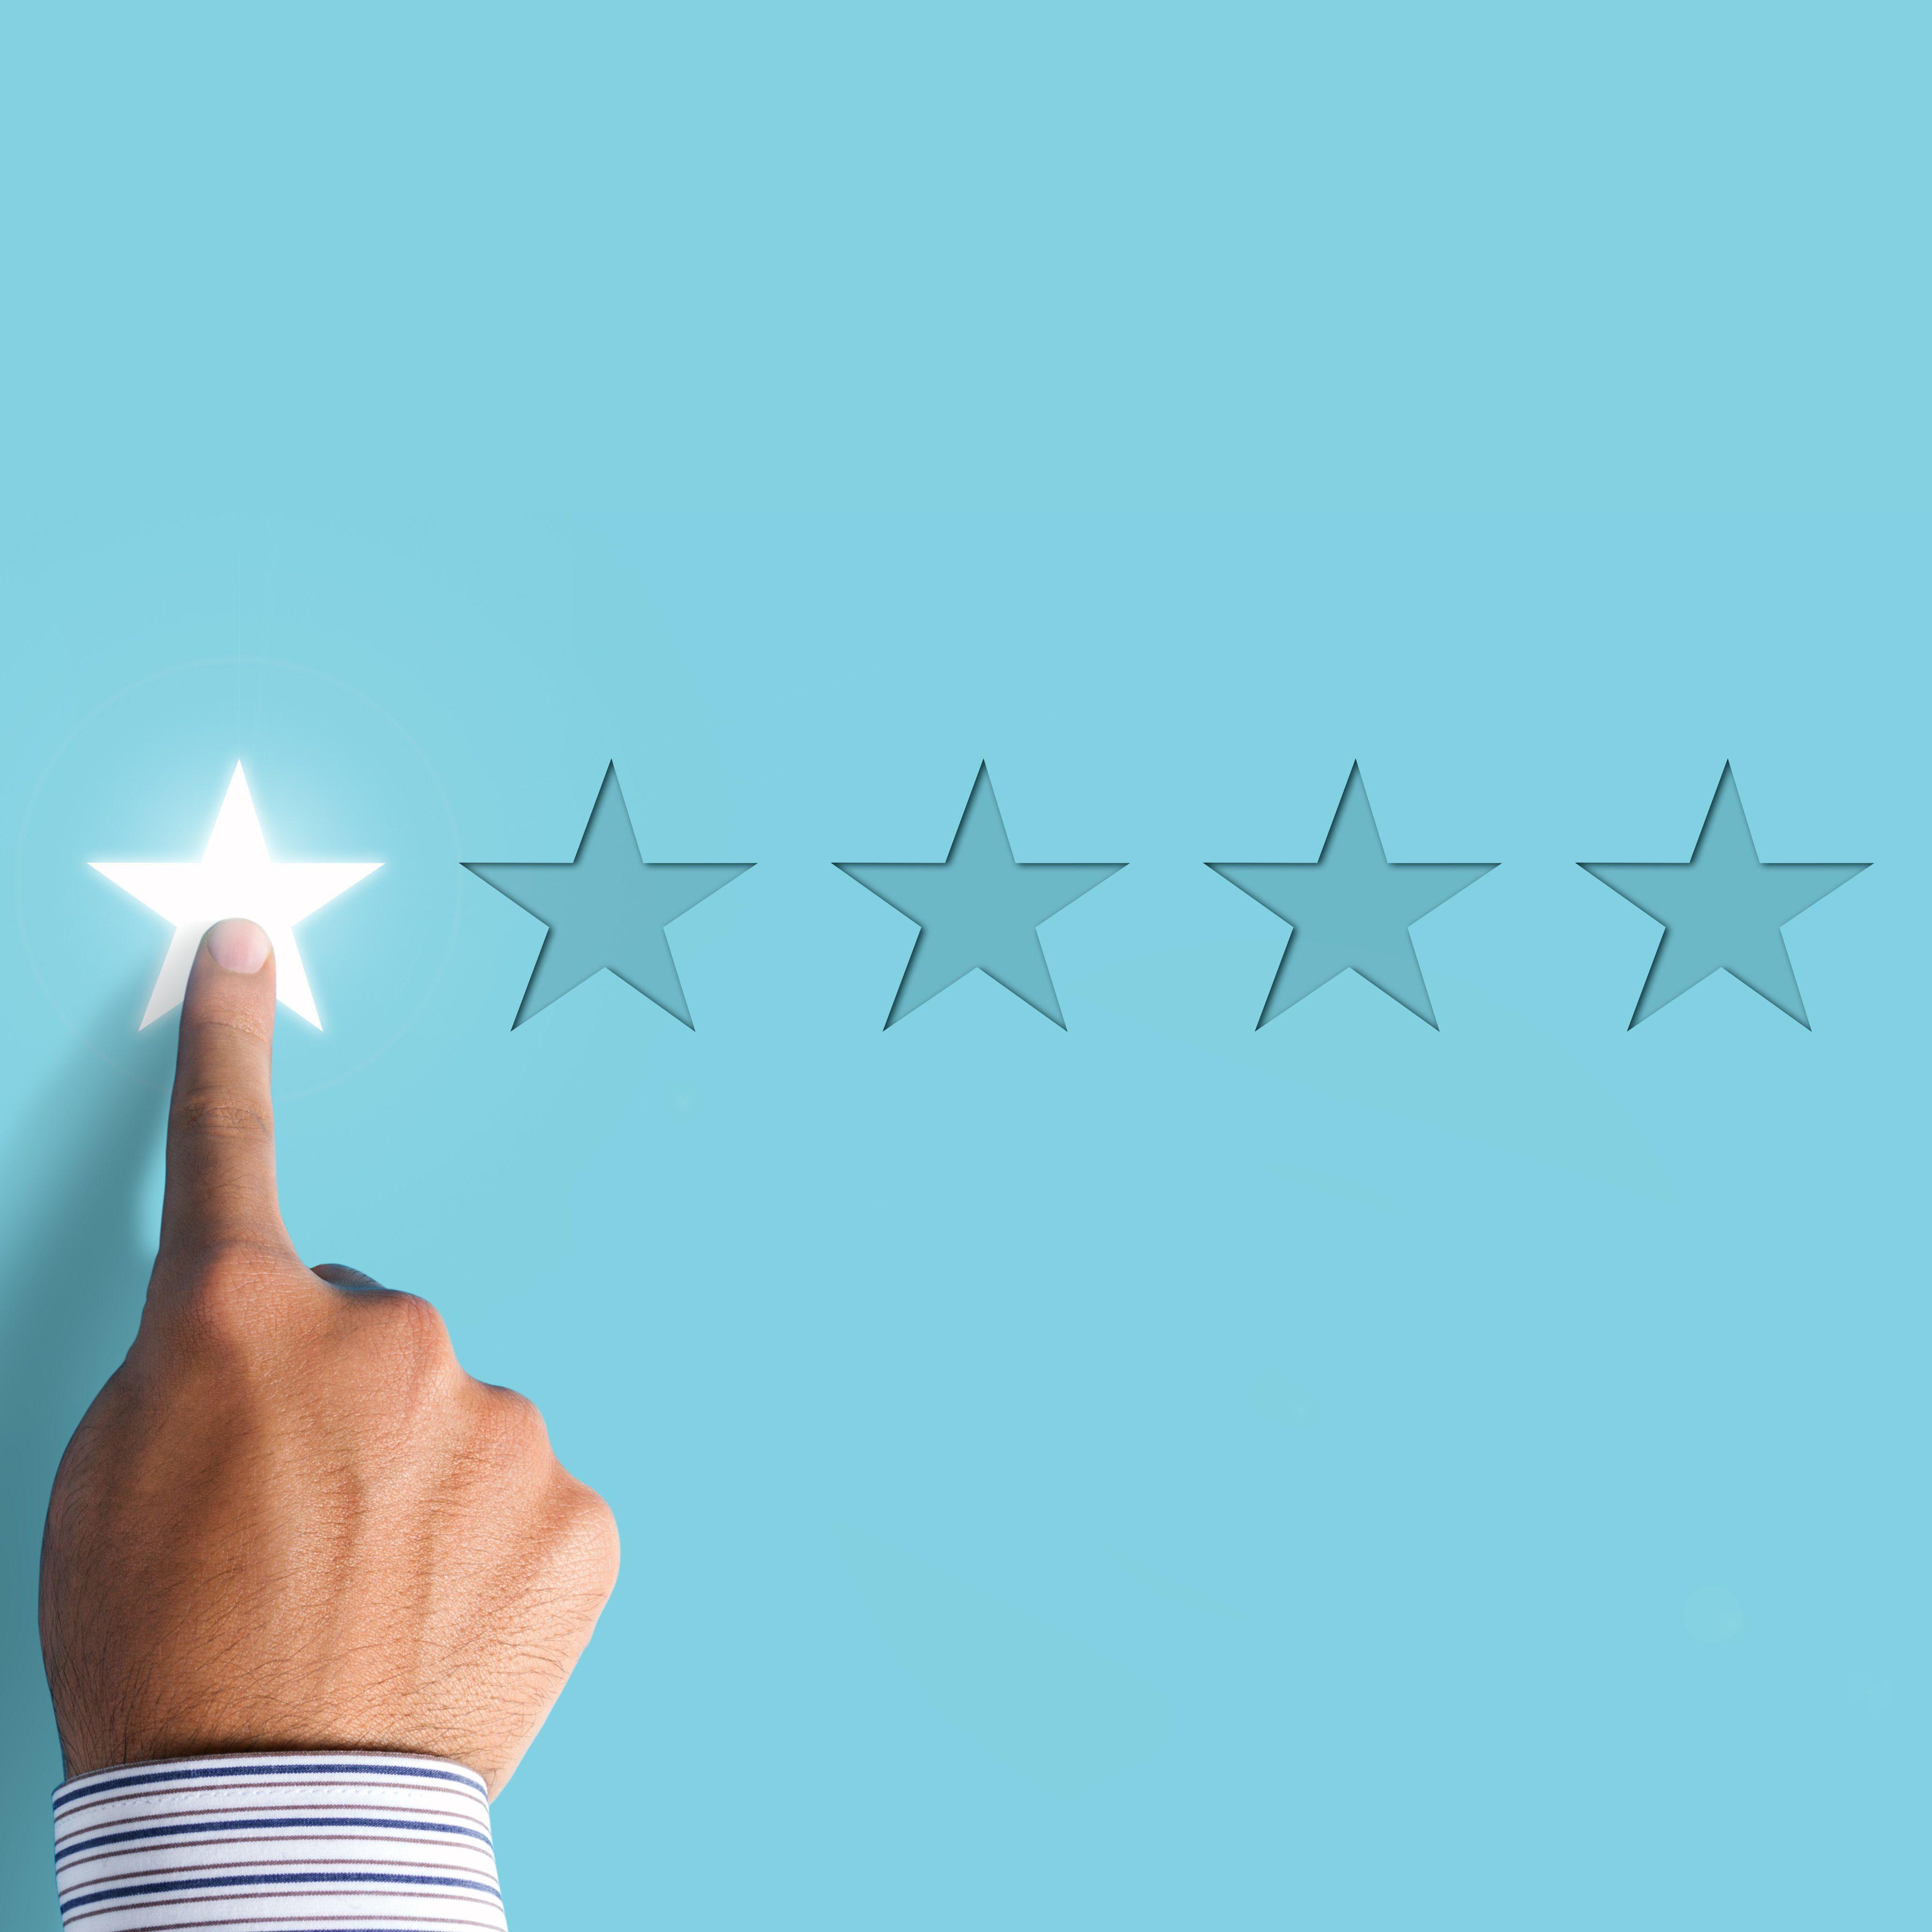 Hand choosing 1 star rating on blue background - negative feedback concept; Shutterstock ID 1129346567; Job (TFH, TOH, RD, BNB, CWM, CM): RD